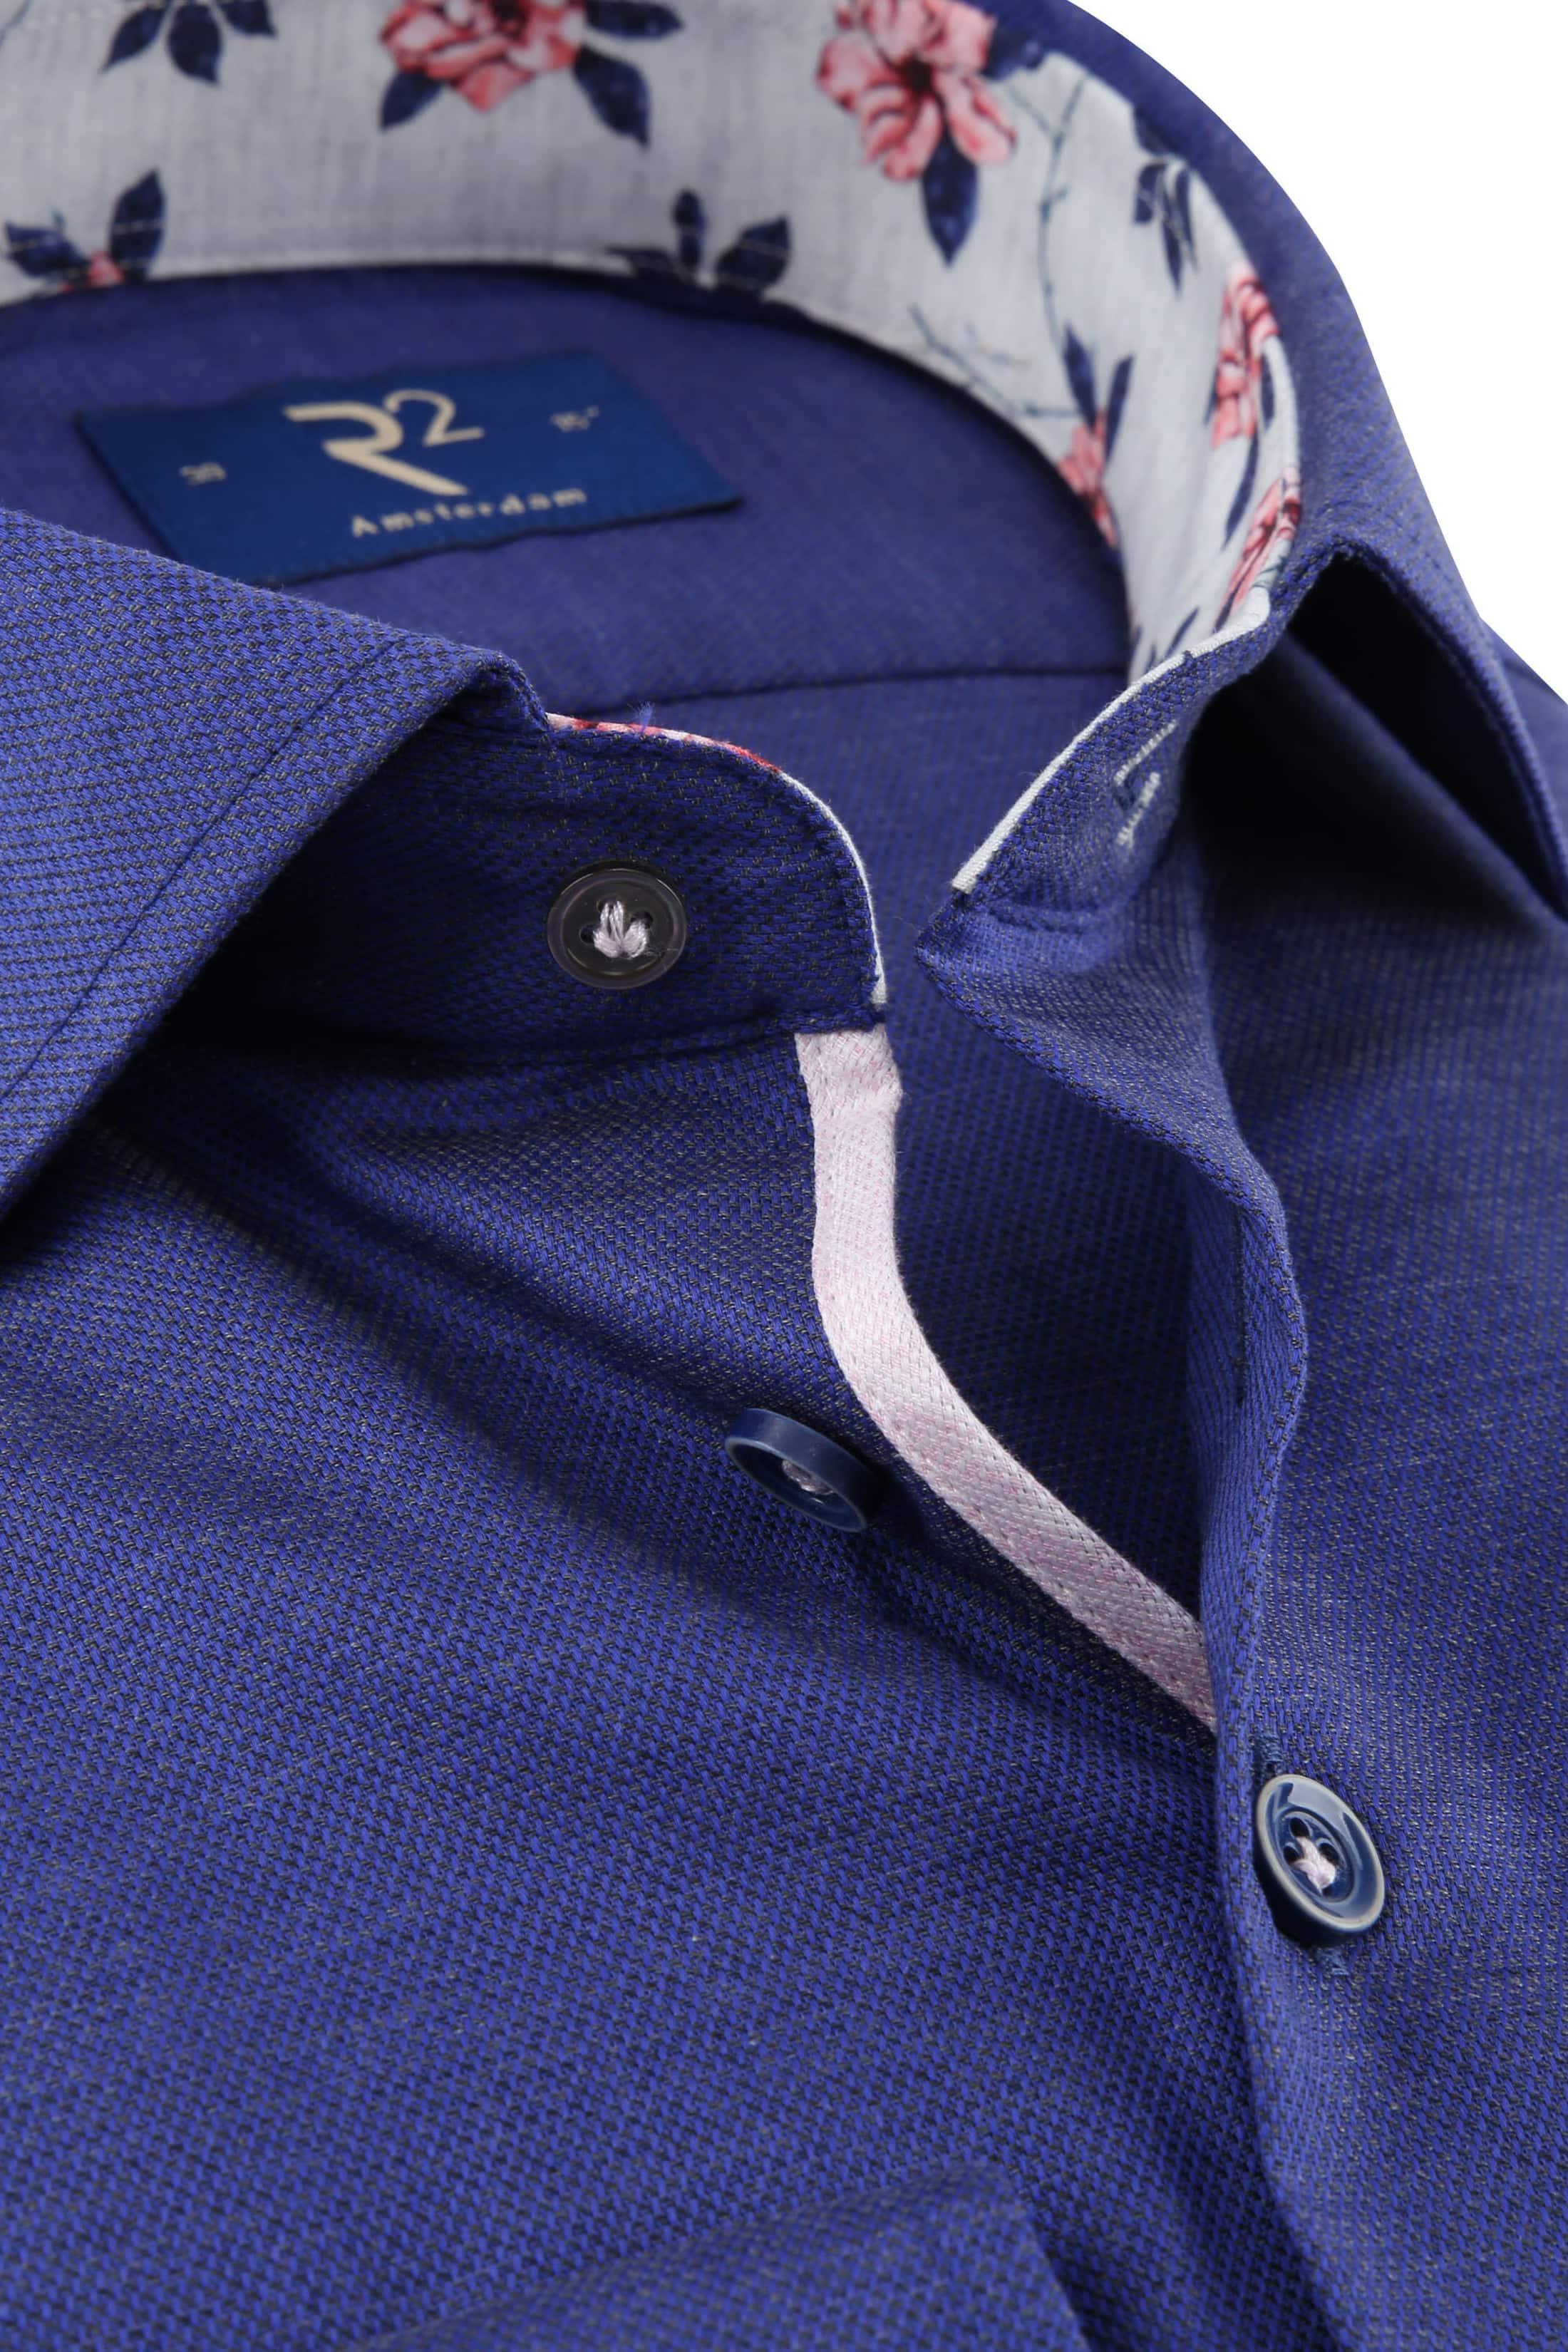 R2 Overhemd Uni Blauw foto 1